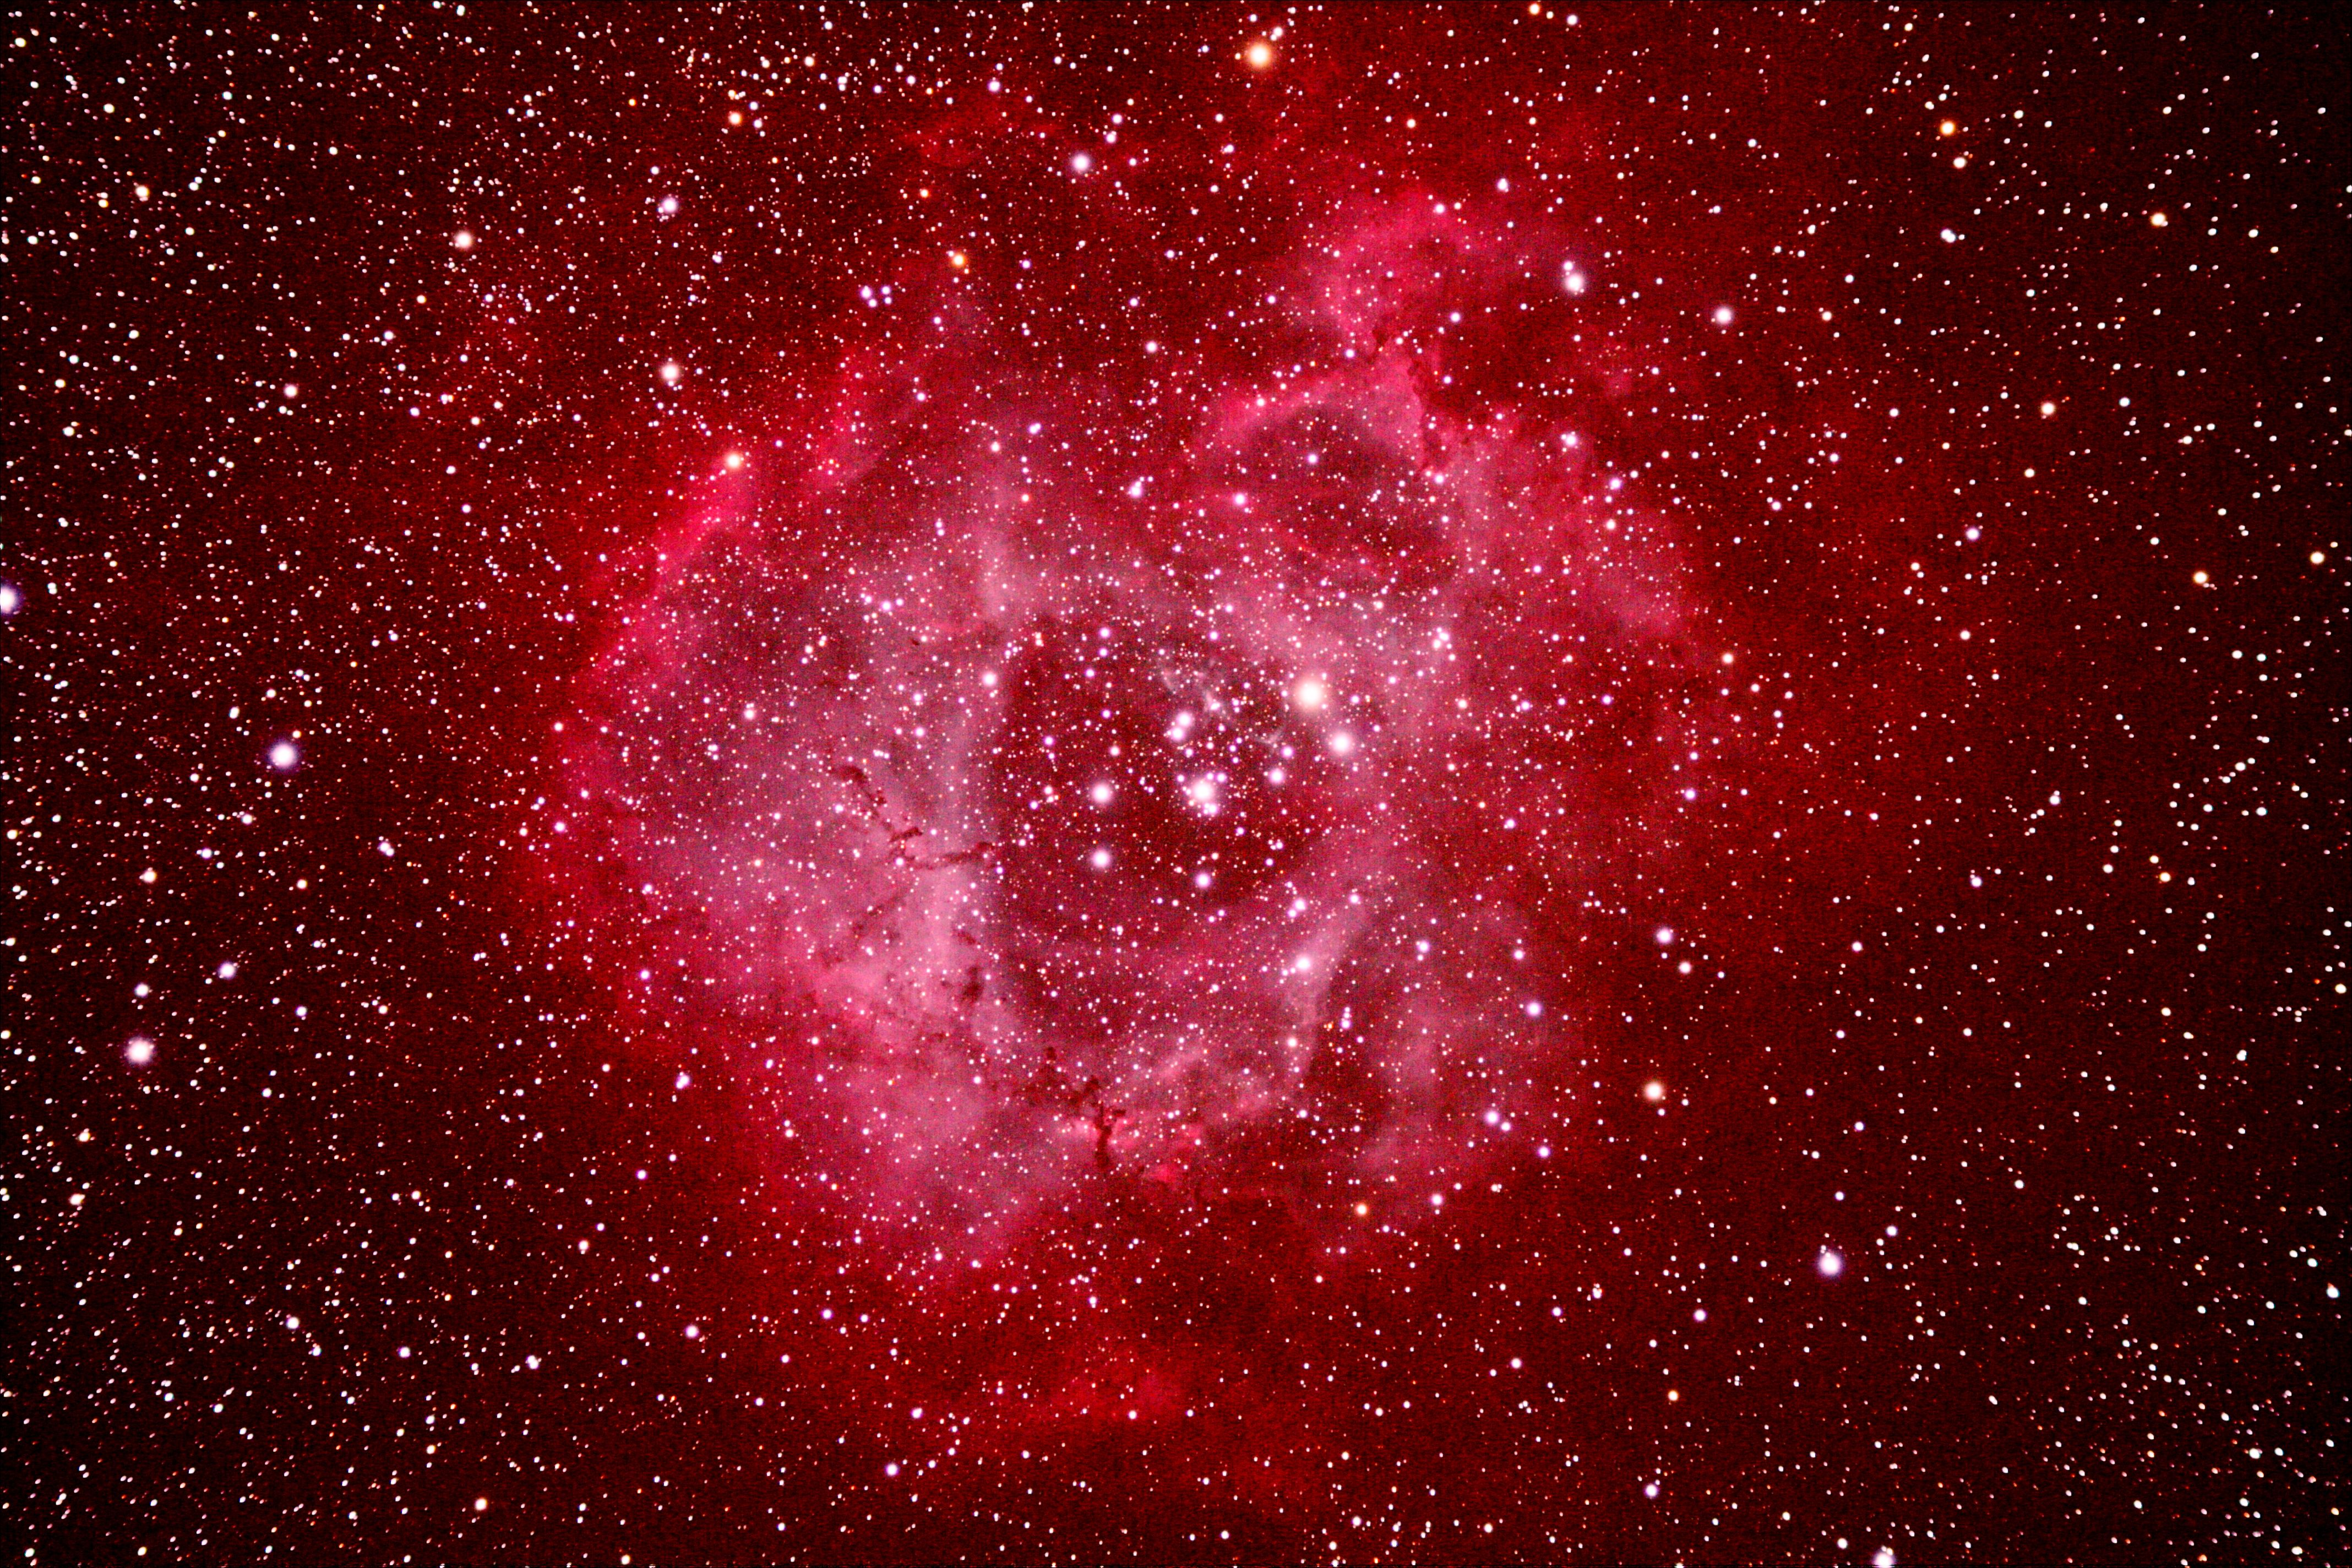 Rosette Nebula 11-2-13